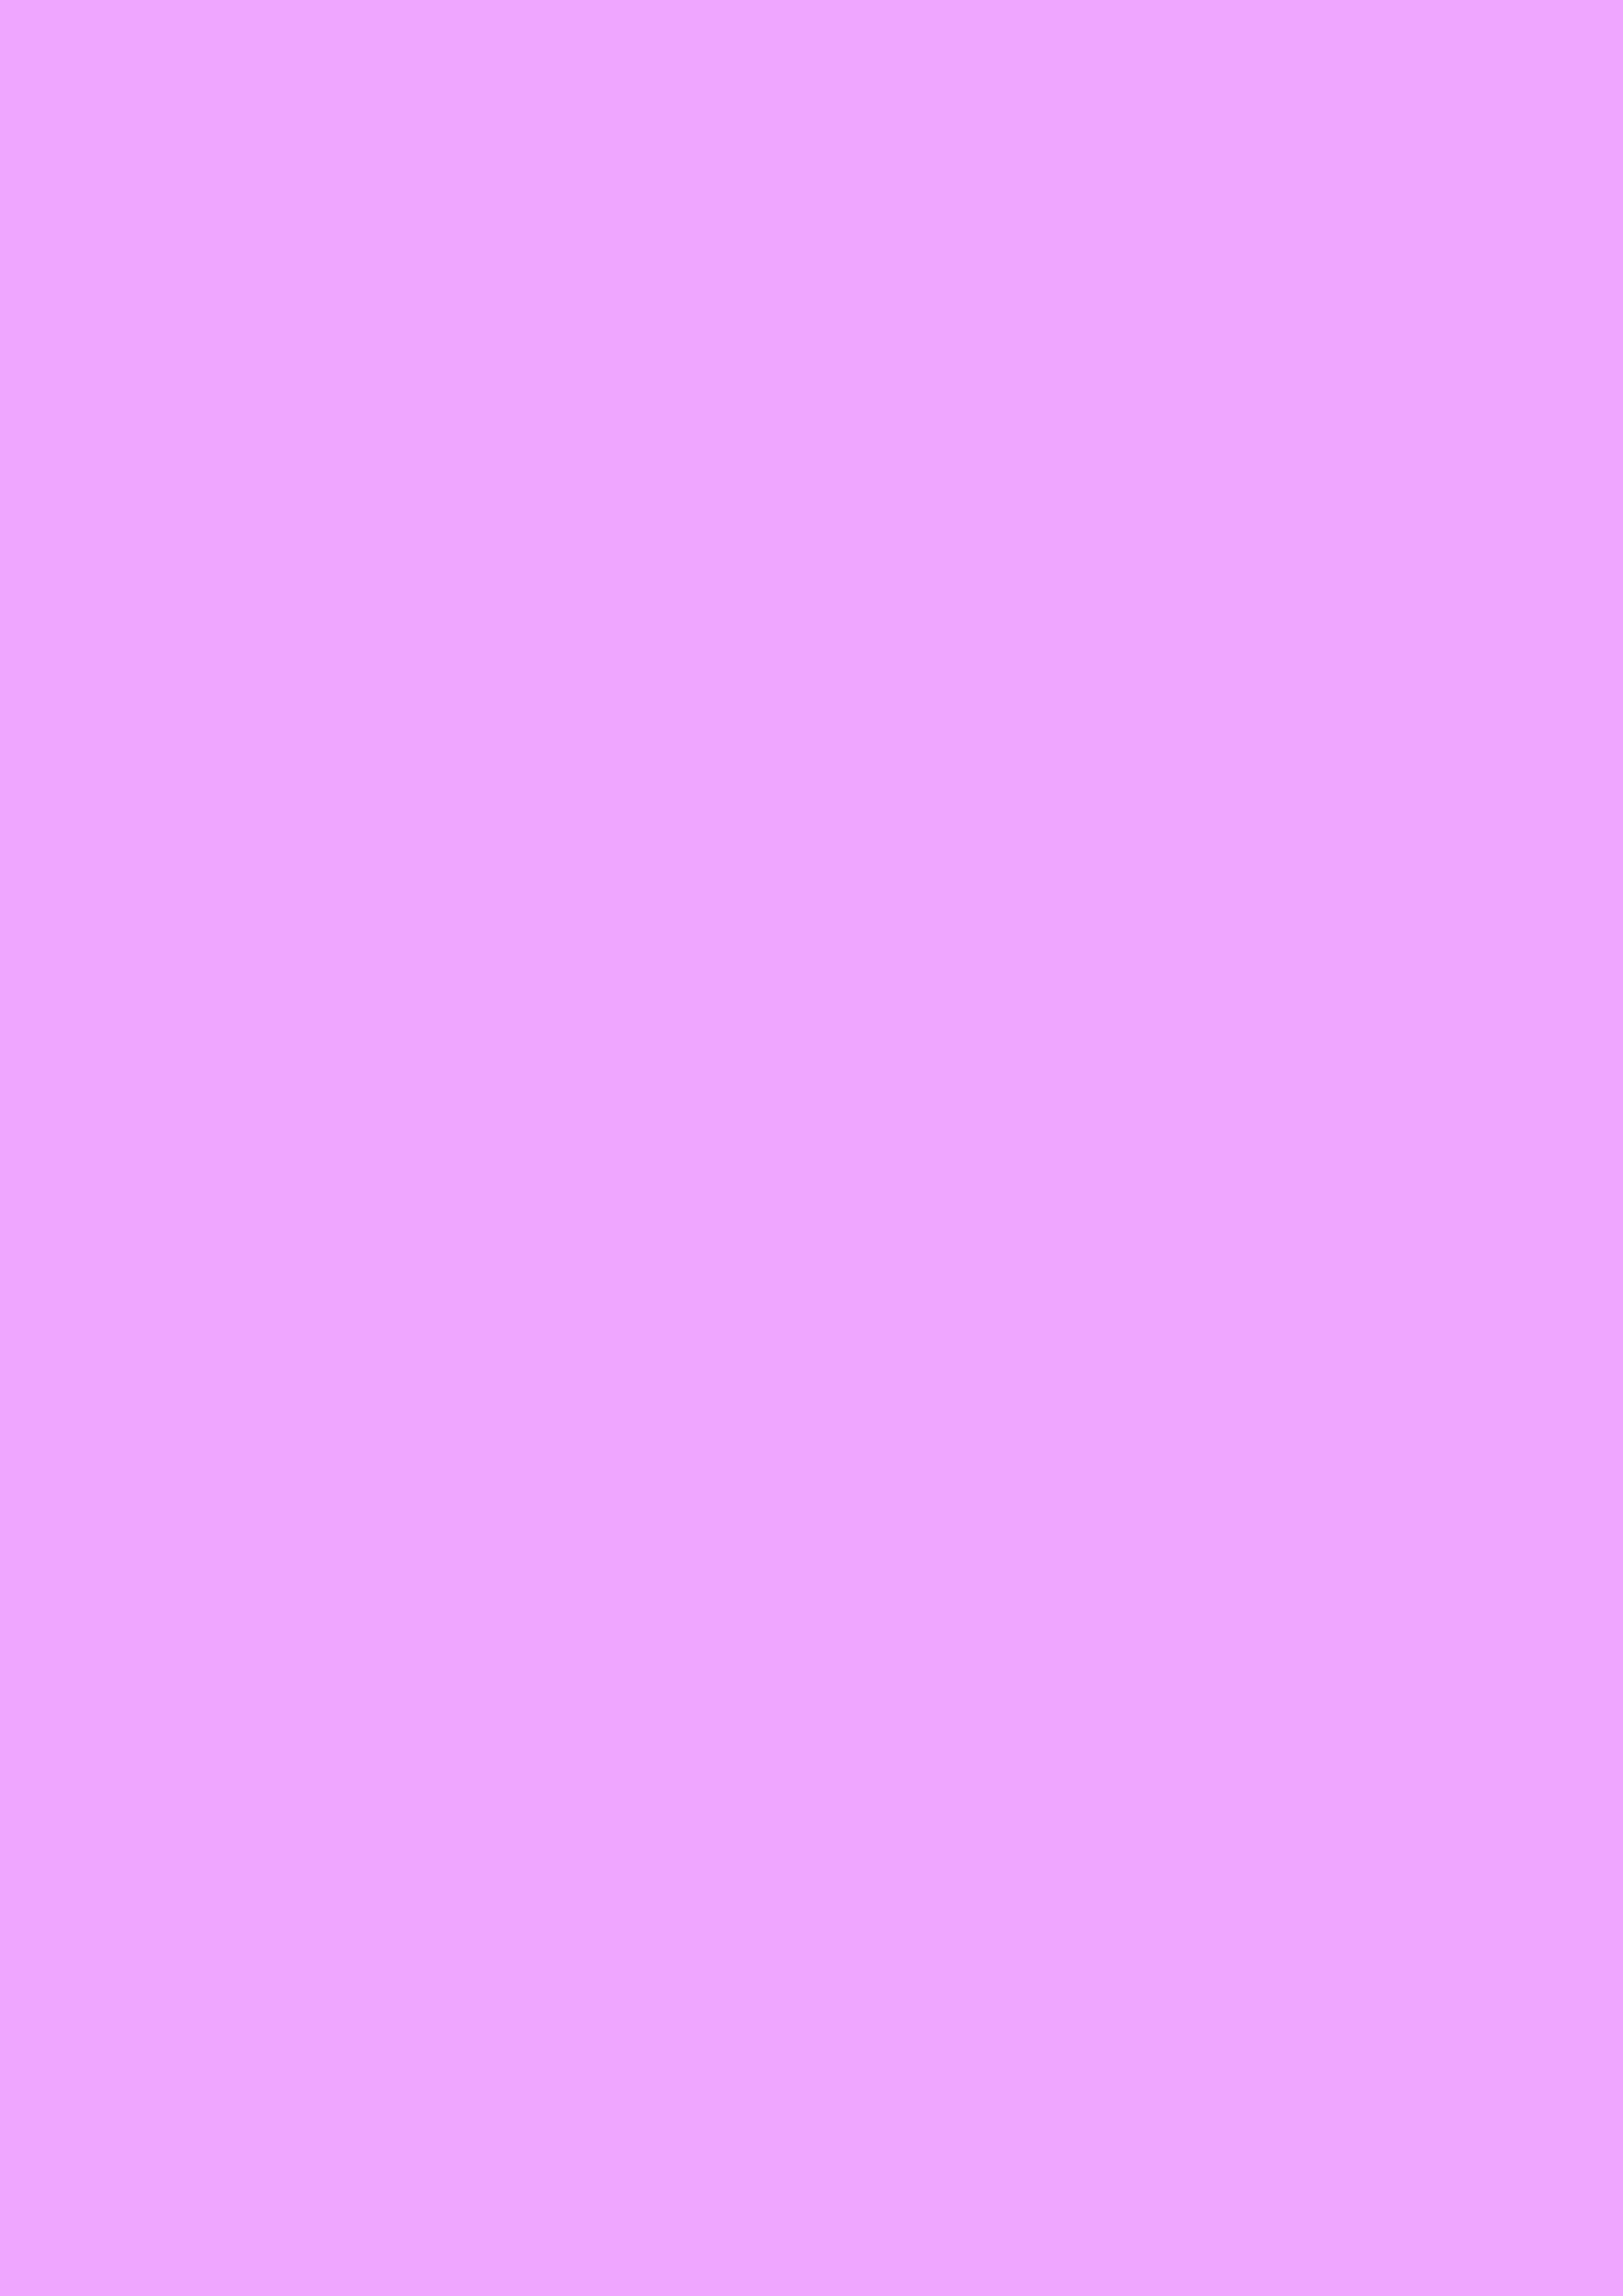 2480x3508 Rich Brilliant Lavender Solid Color Background